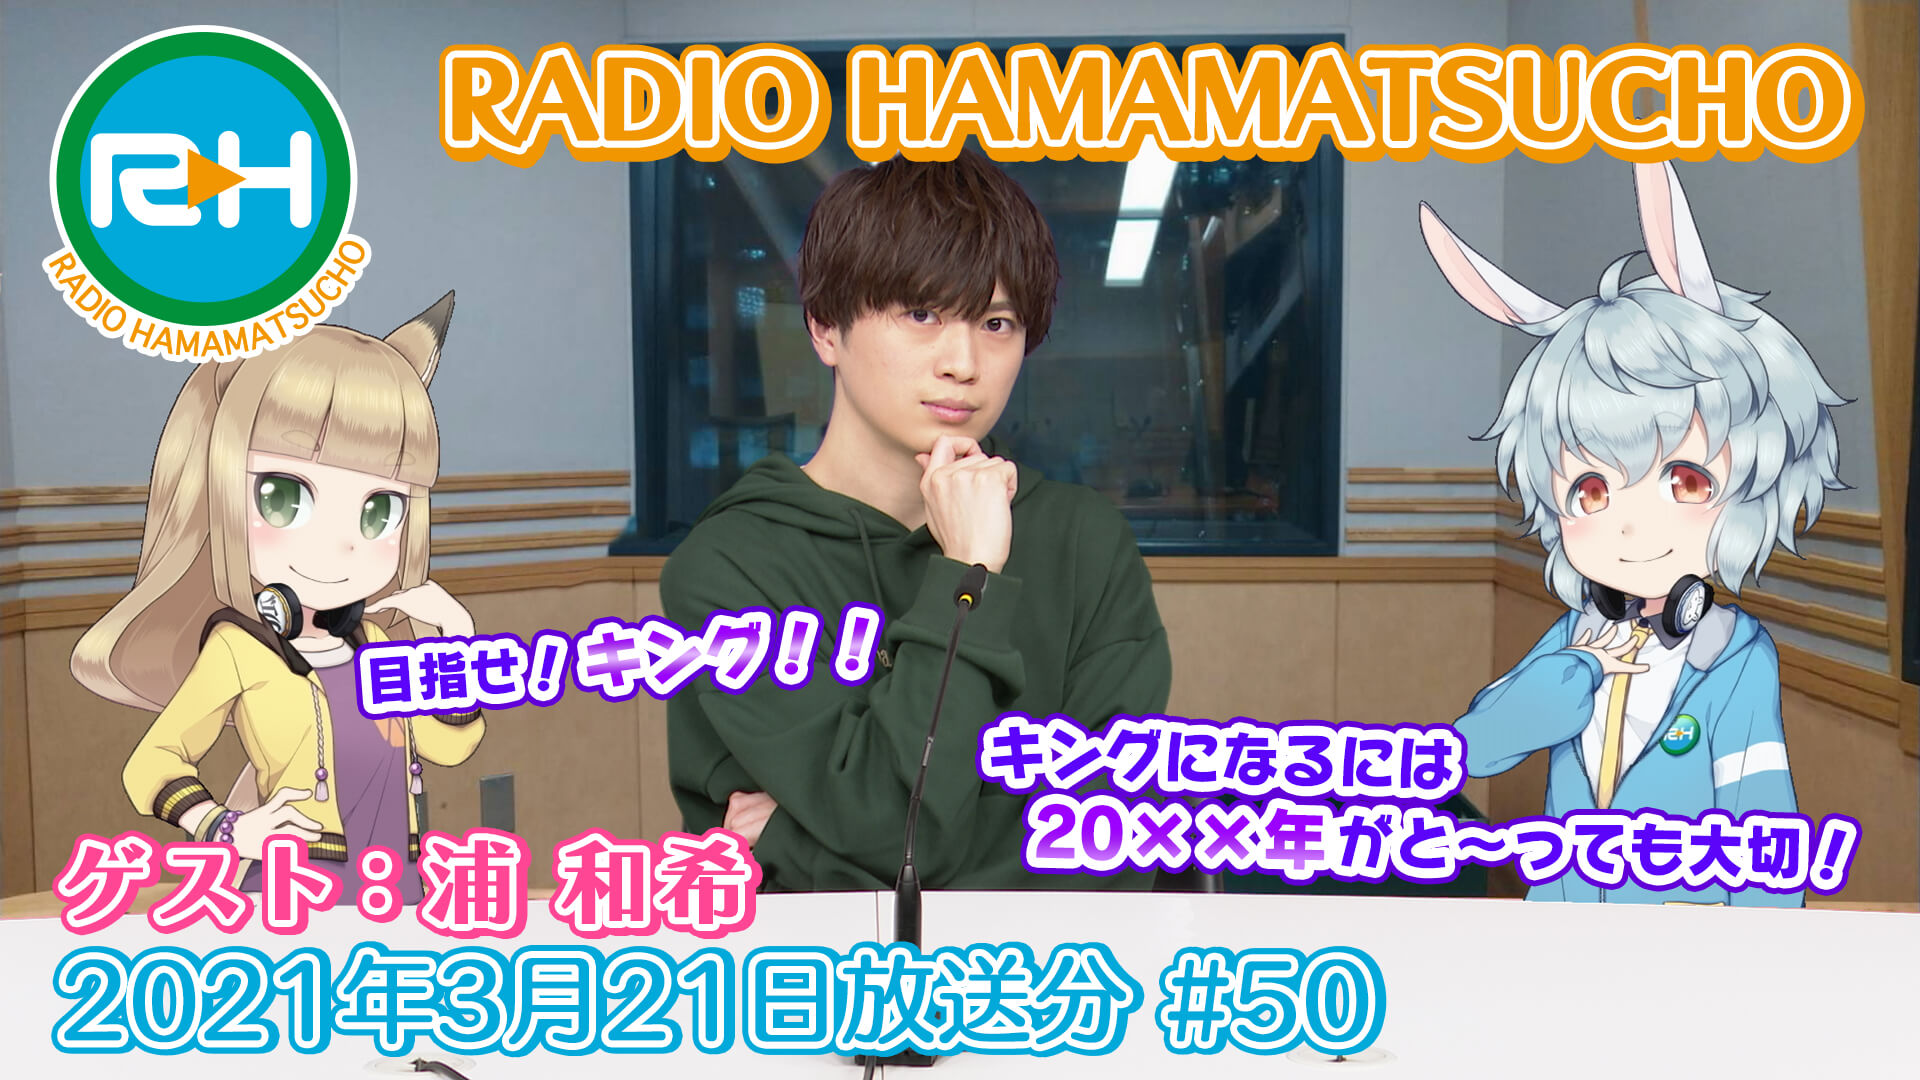 RADIO HAMAMATSUCHO 第50回 (2021年3月21日放送分) ゲスト: 浦 和希